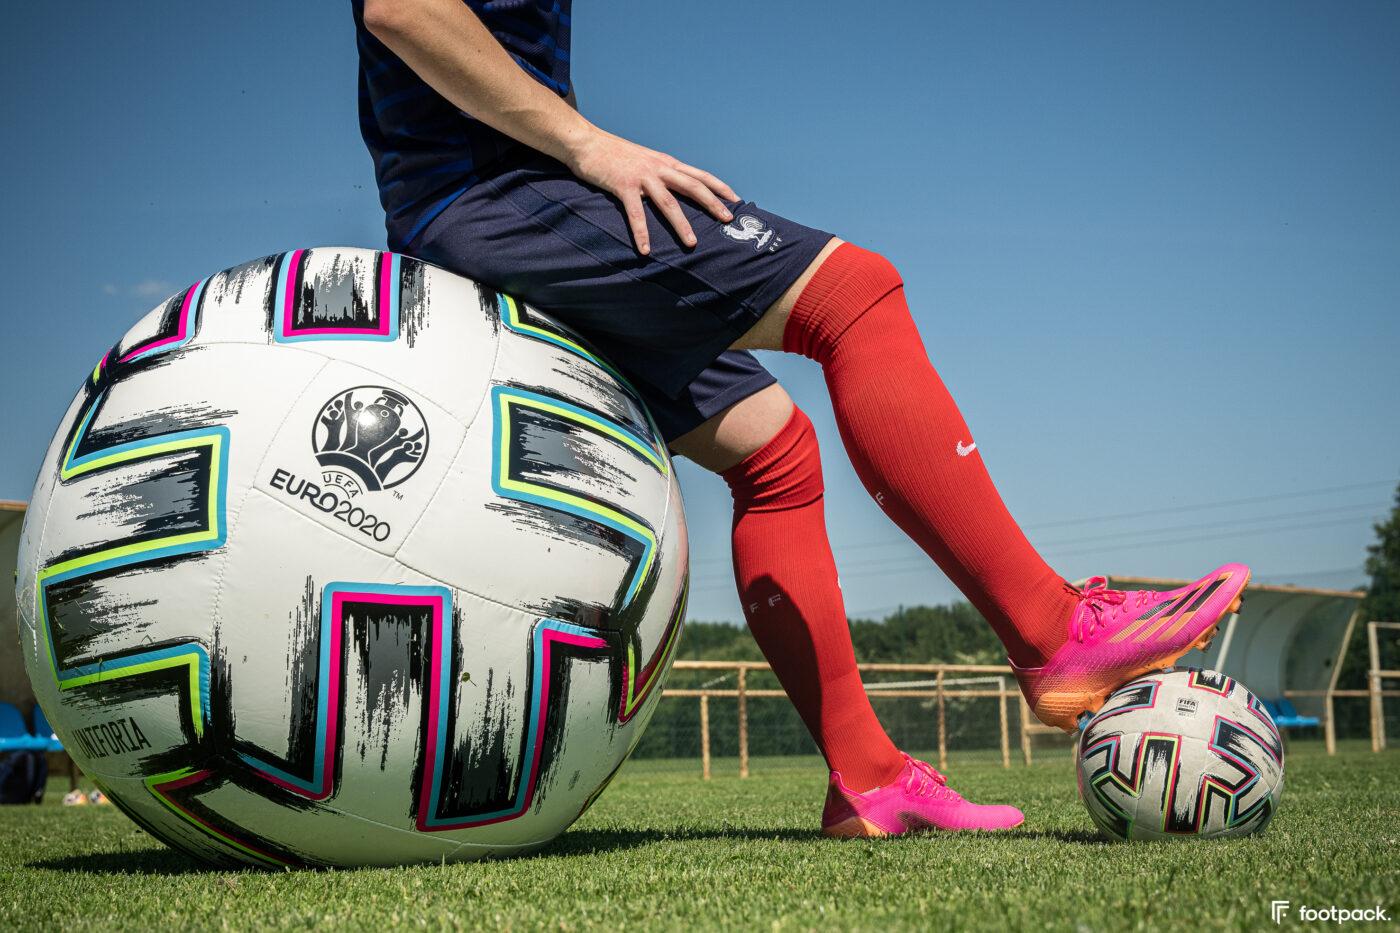 Ballon adidas Jumbo Euro 2020